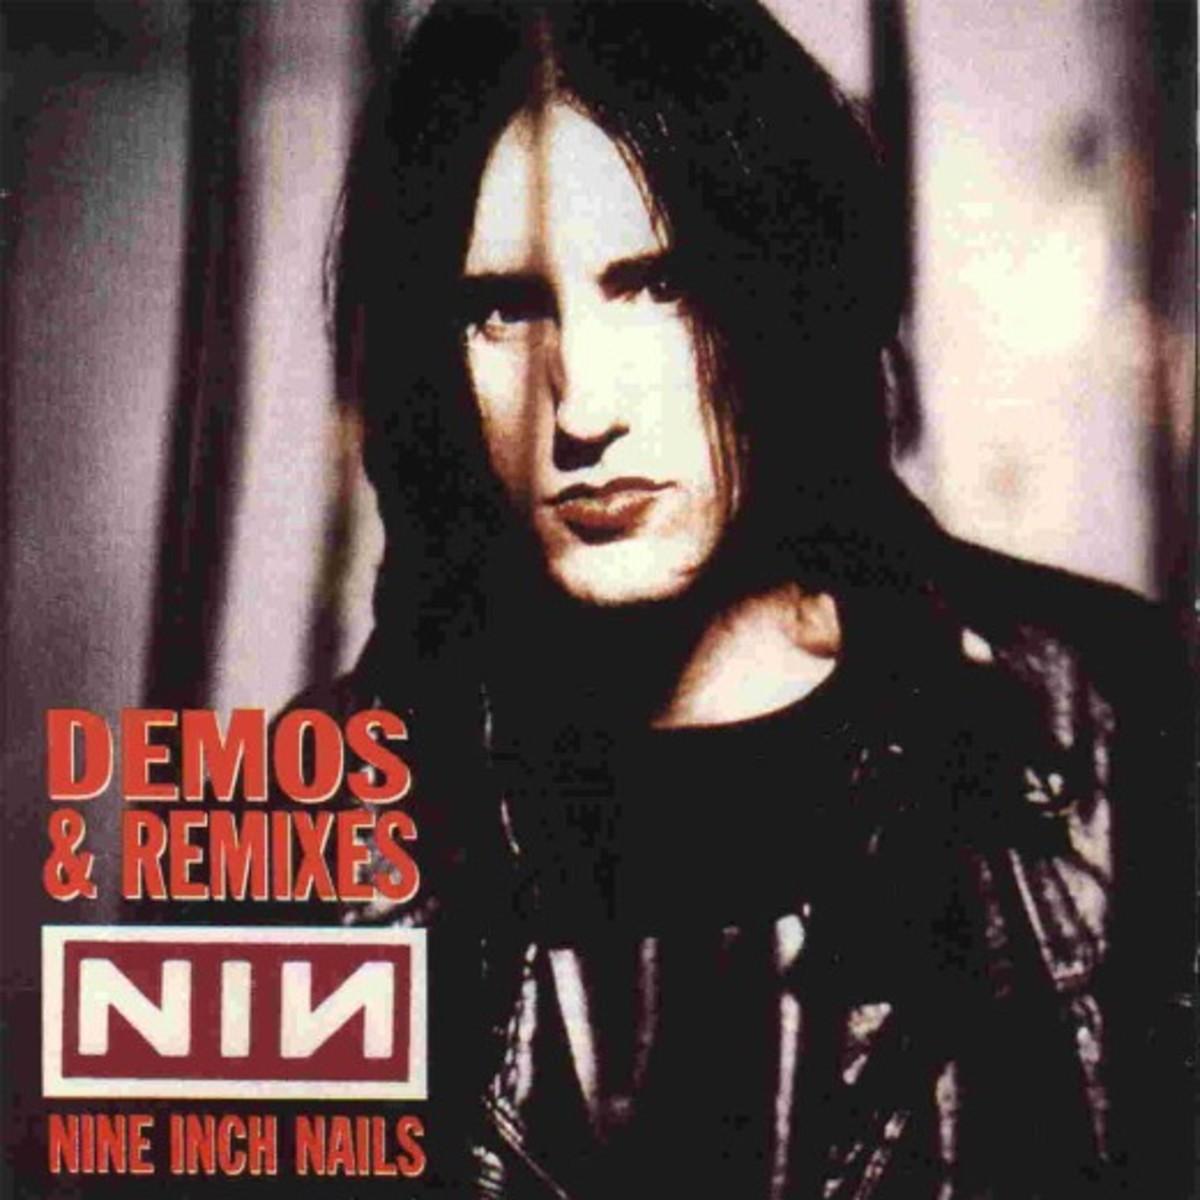 Nine Inch Nails - Demos & Remixes - Front